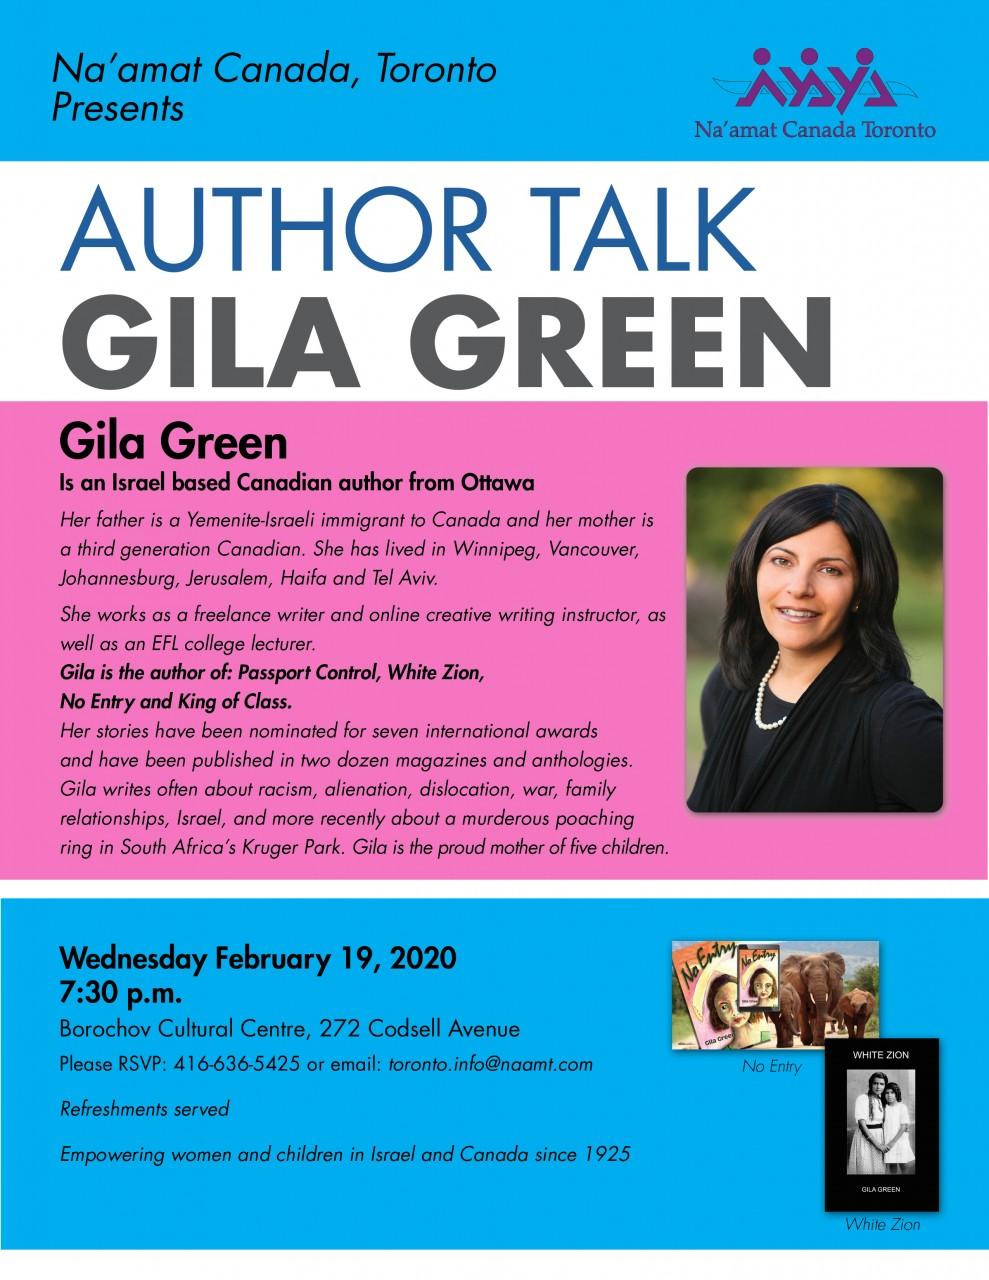 Gila-green-2020.jpg_Naamat-Canada-Toronto